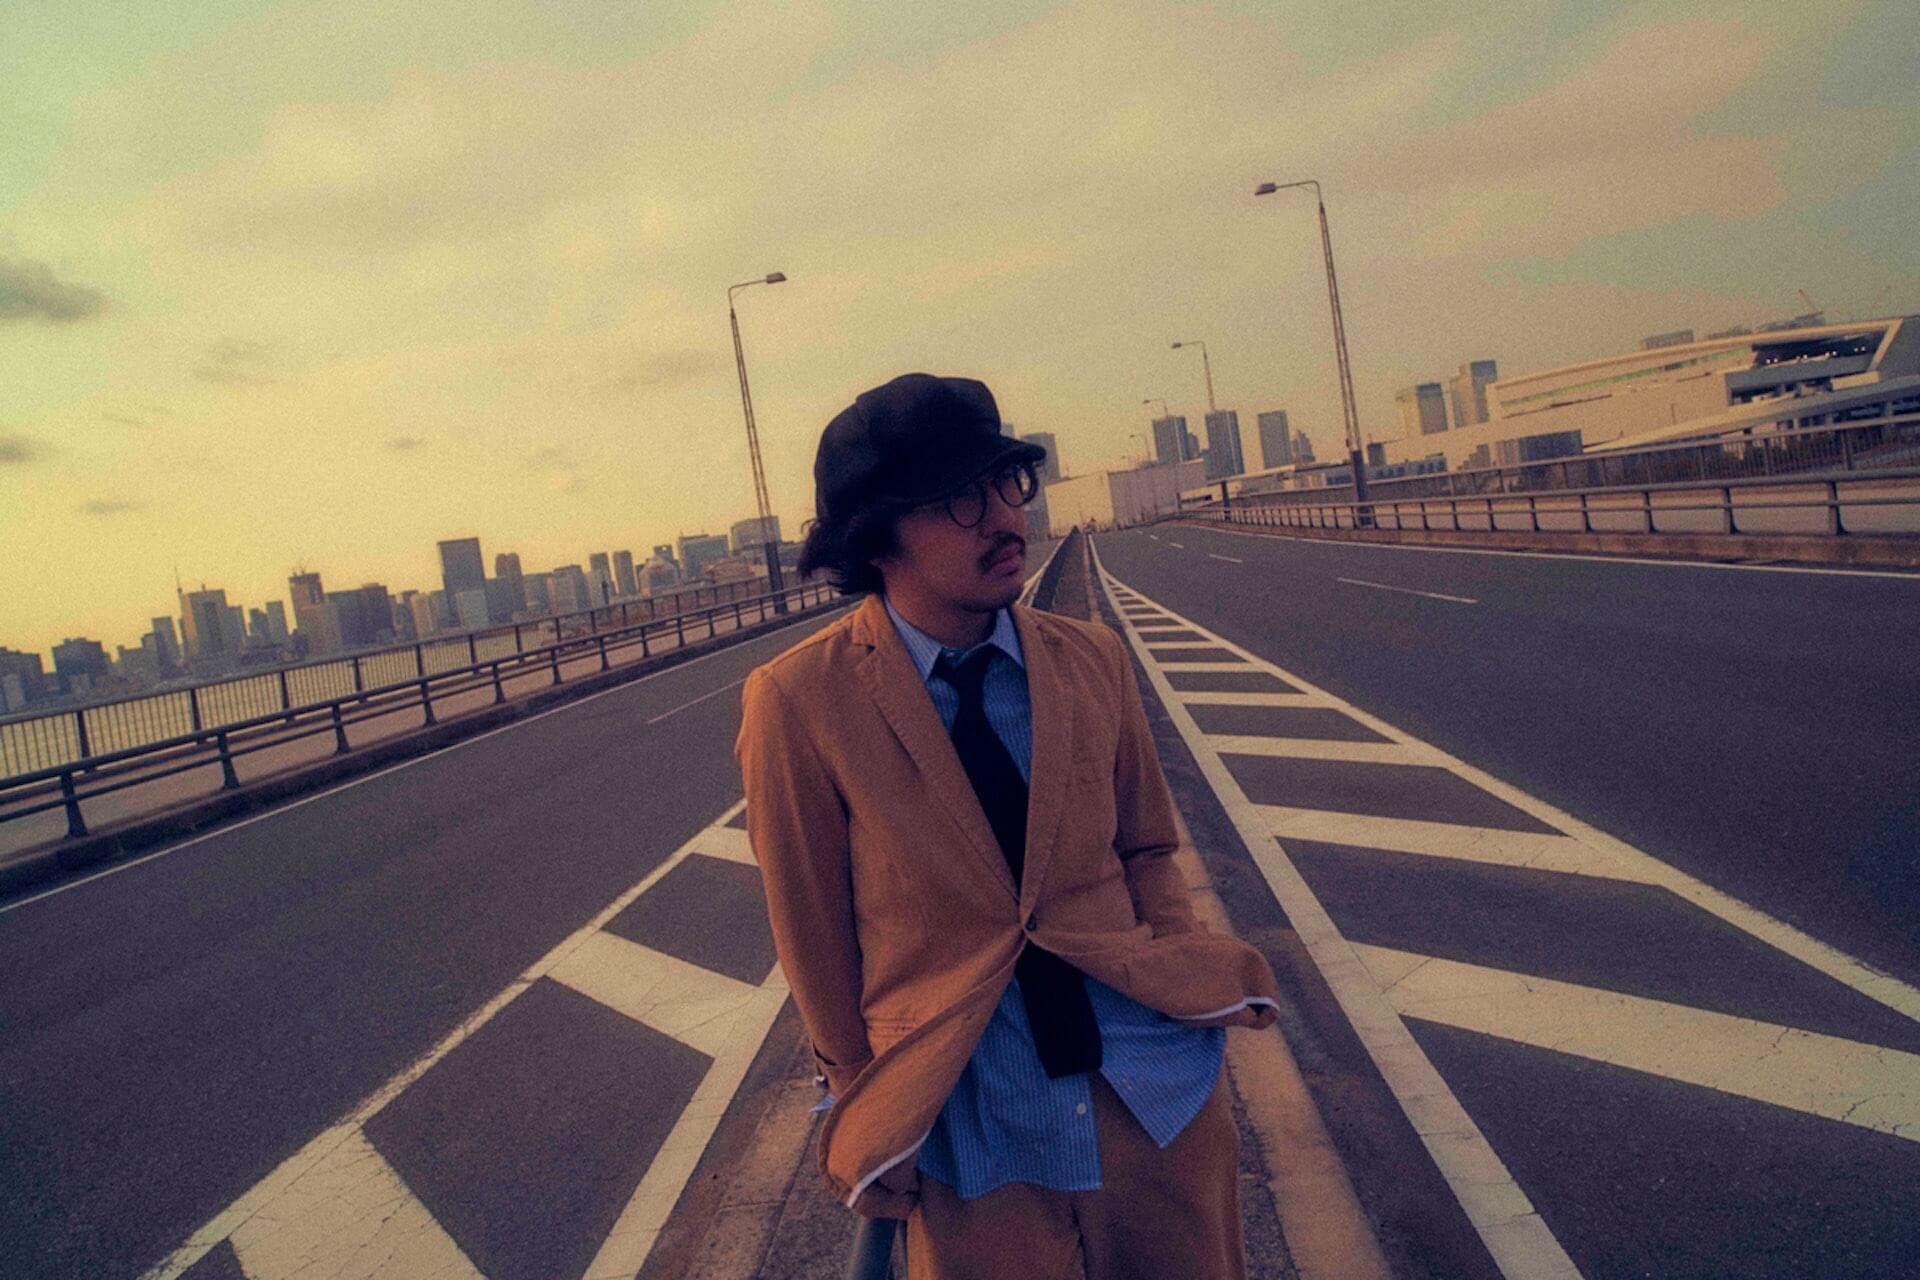 J-WAVE「#音楽を止めるな」プロジェクト無観客ライブにTENDRE、NakamuraEmi、THE CHARM PARKらが登場! music200417_ongakuwotomeruna_03